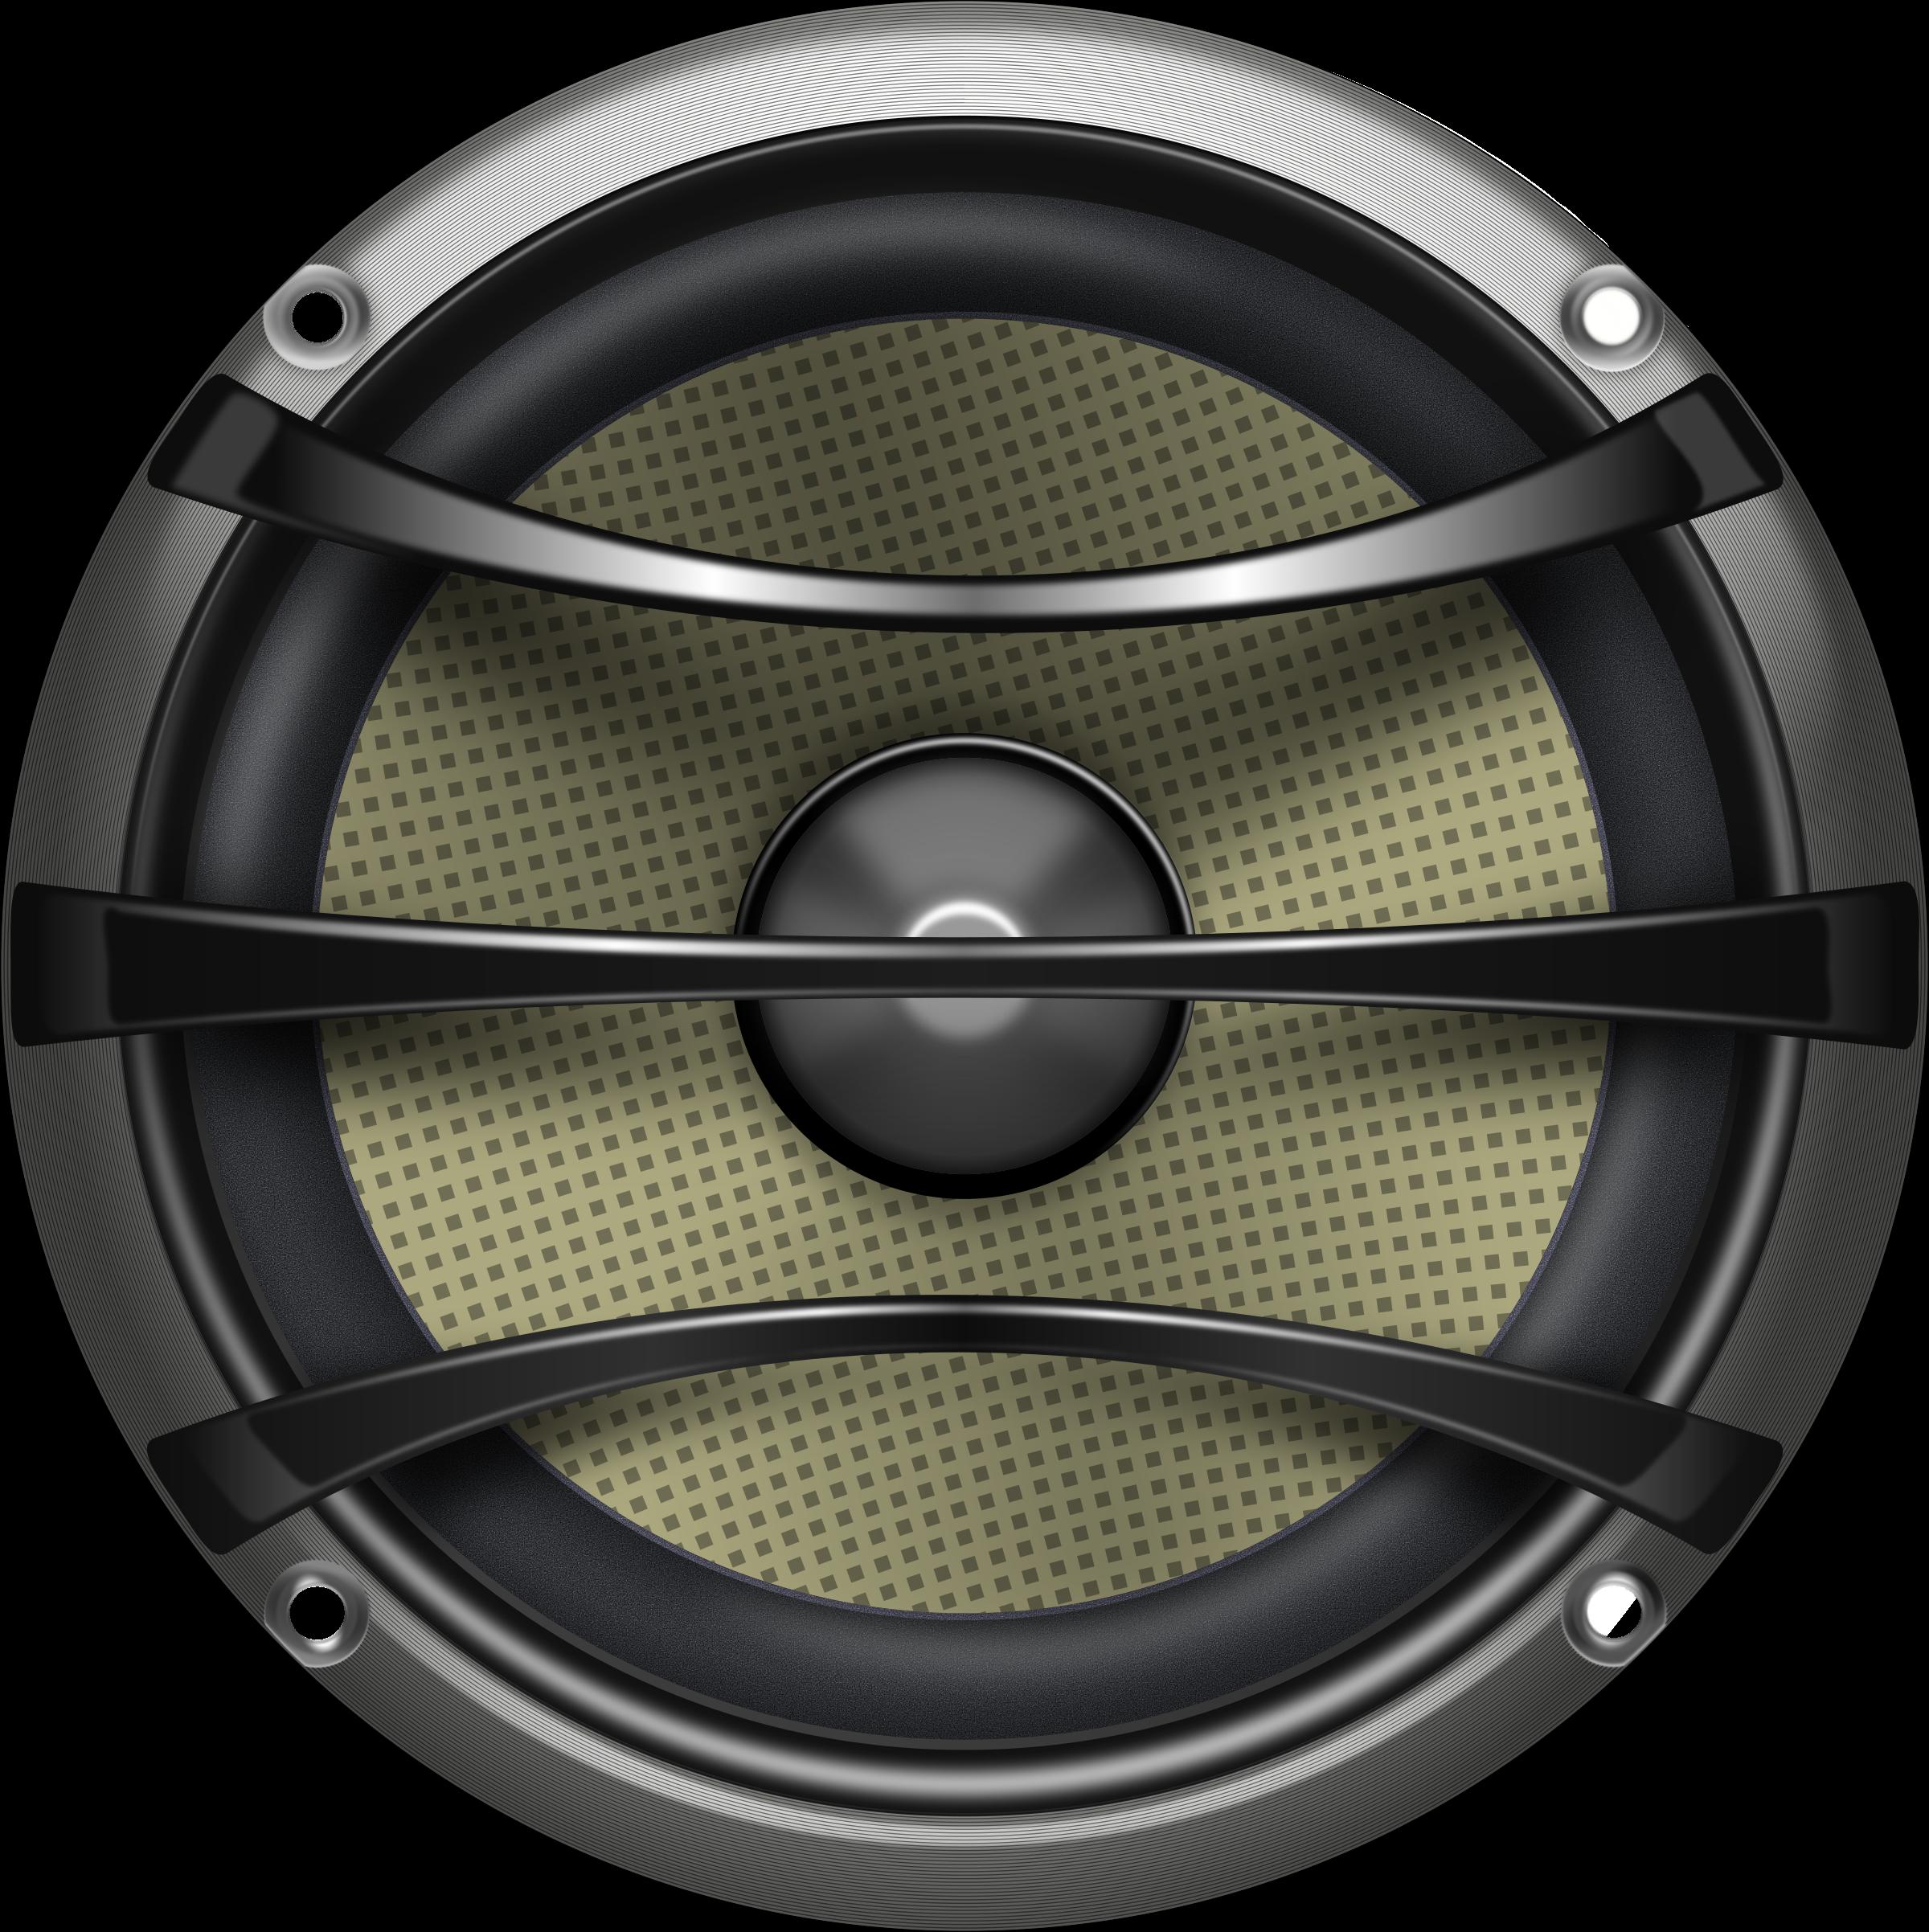 Car speaker clipart picture transparent stock Clipart - subwoofer picture transparent stock